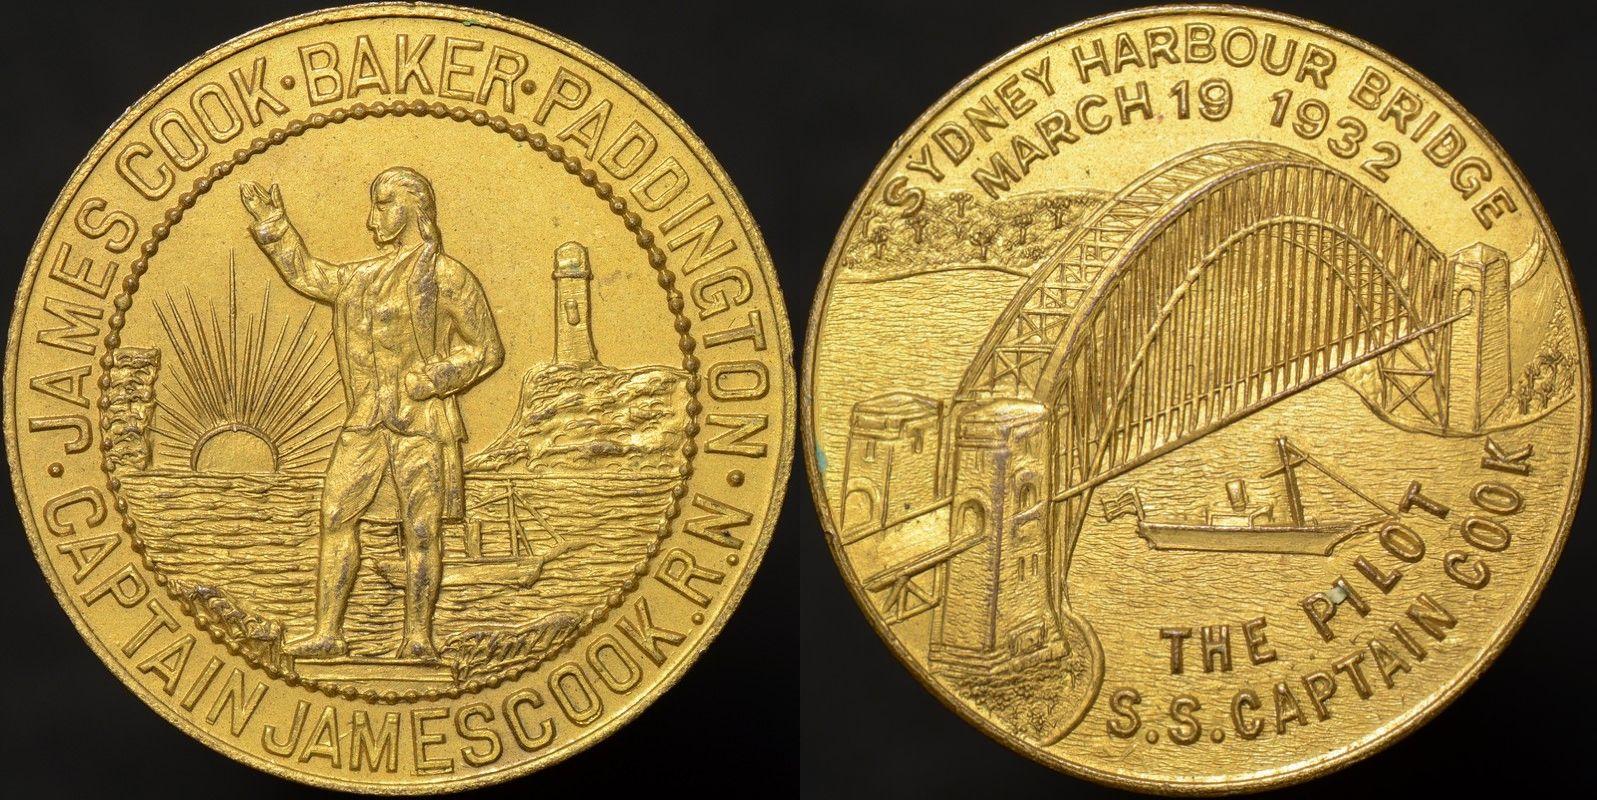 Sydney Harbour Bridge James Cook Baker Paddington Medal 1932/2